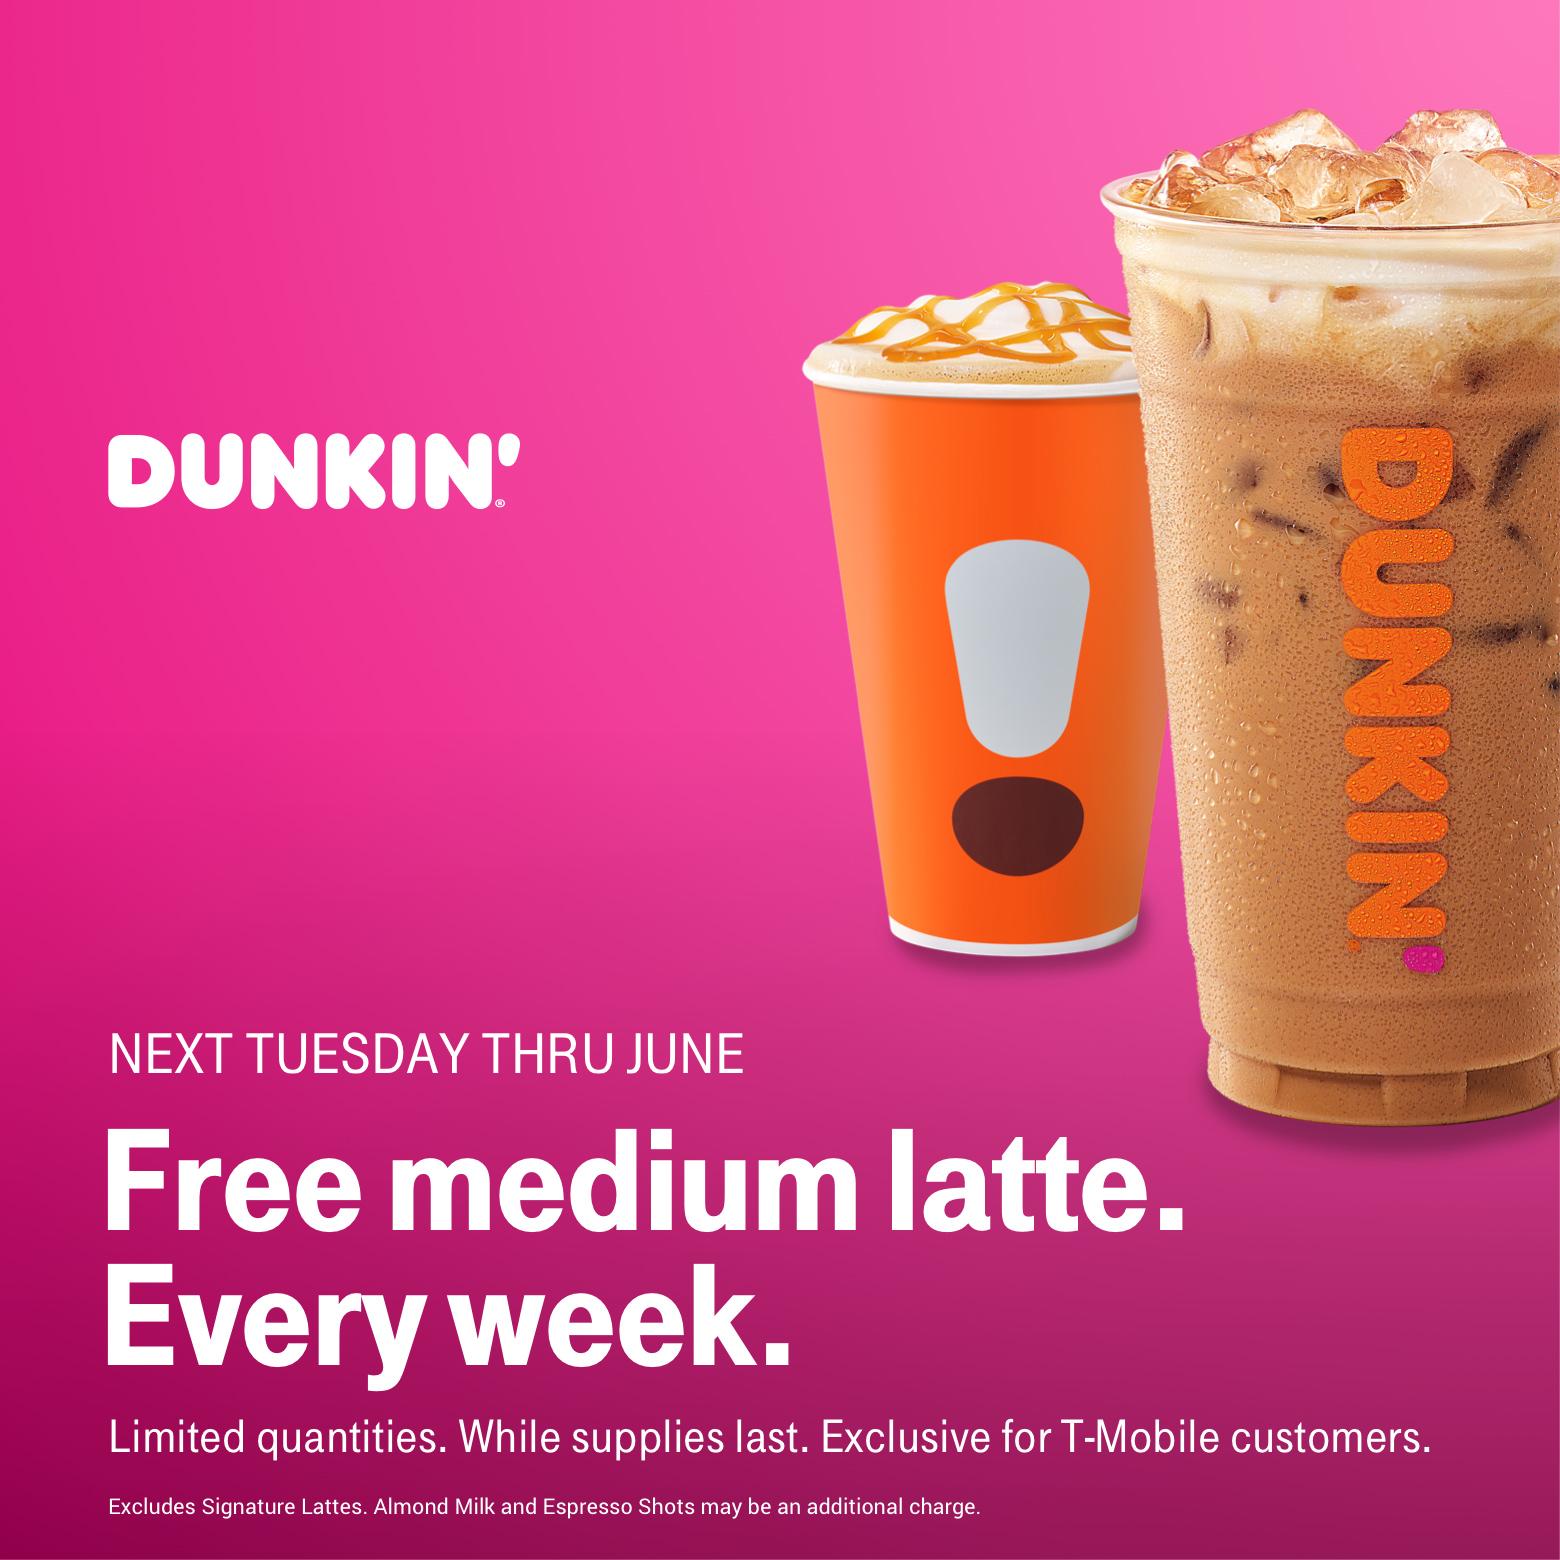 T-Mobile Customers (04/09): $4 movie ticket to Hellboy, $15 off Cheryl's Cookies, Dunkin' Free Medium Latte